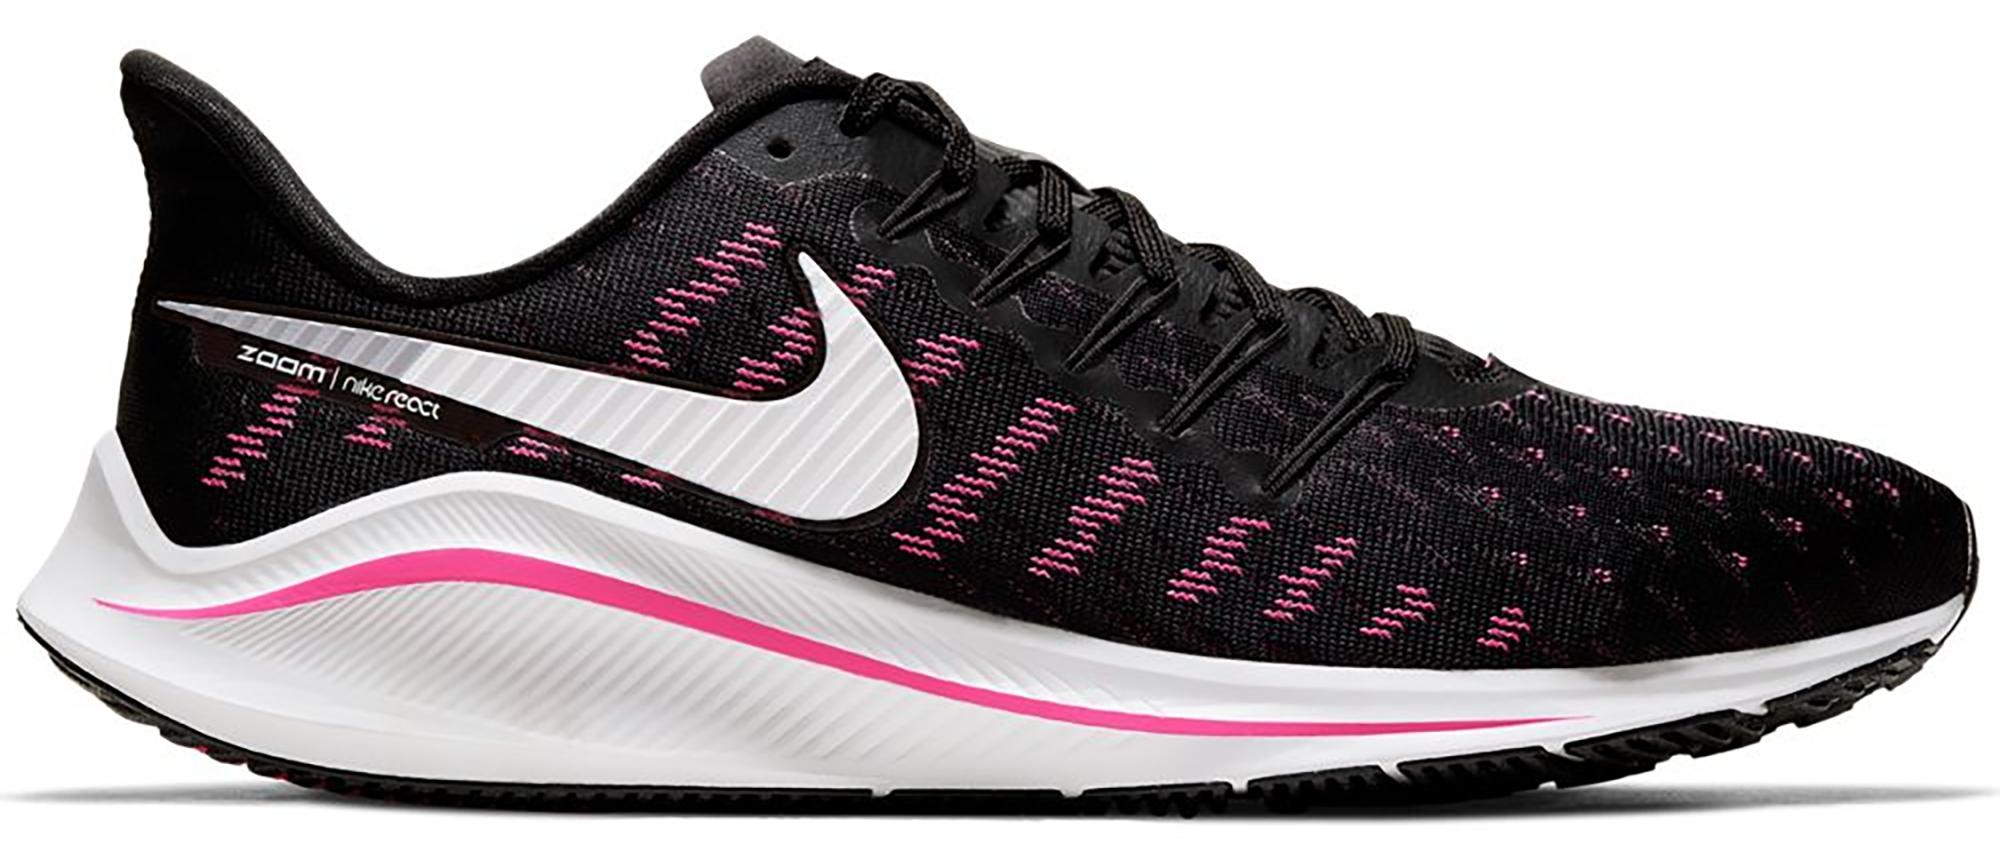 Nike Air Zoom Vomero 14 Black Pink